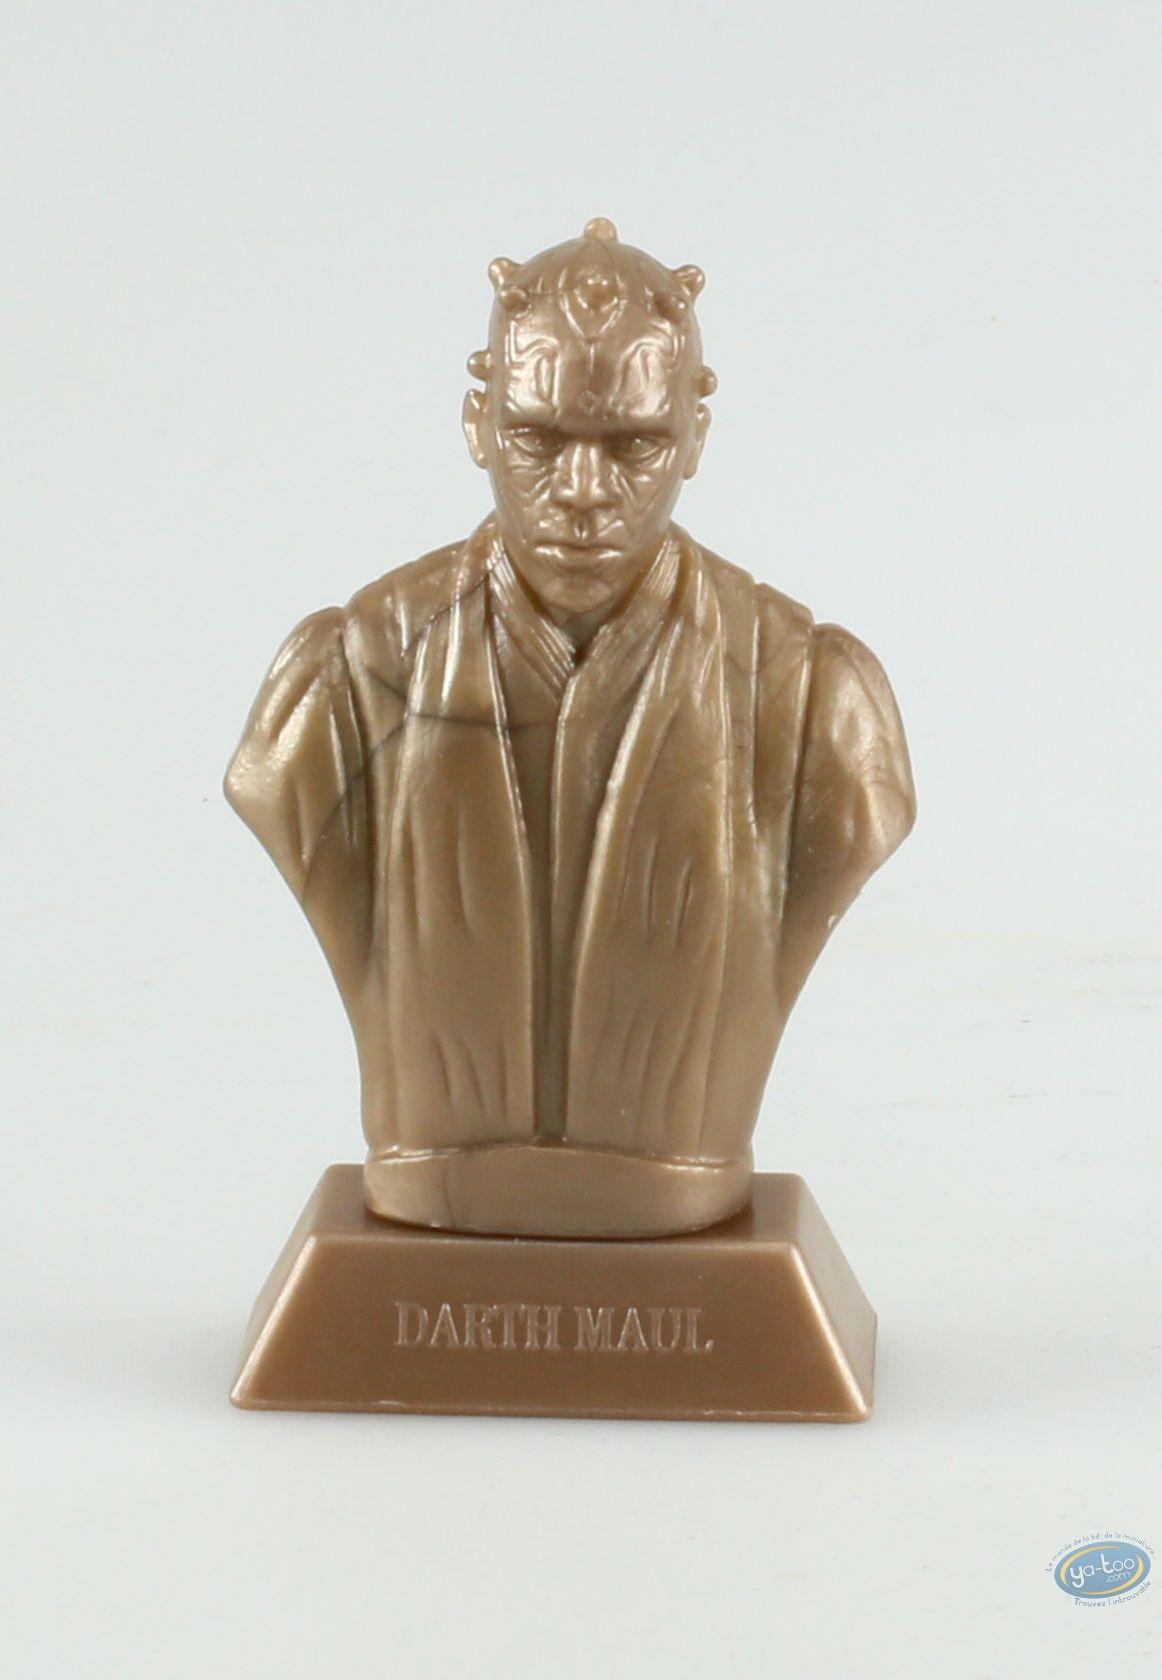 Plastic Figurine, Star Wars : Darth Maul, episode 1